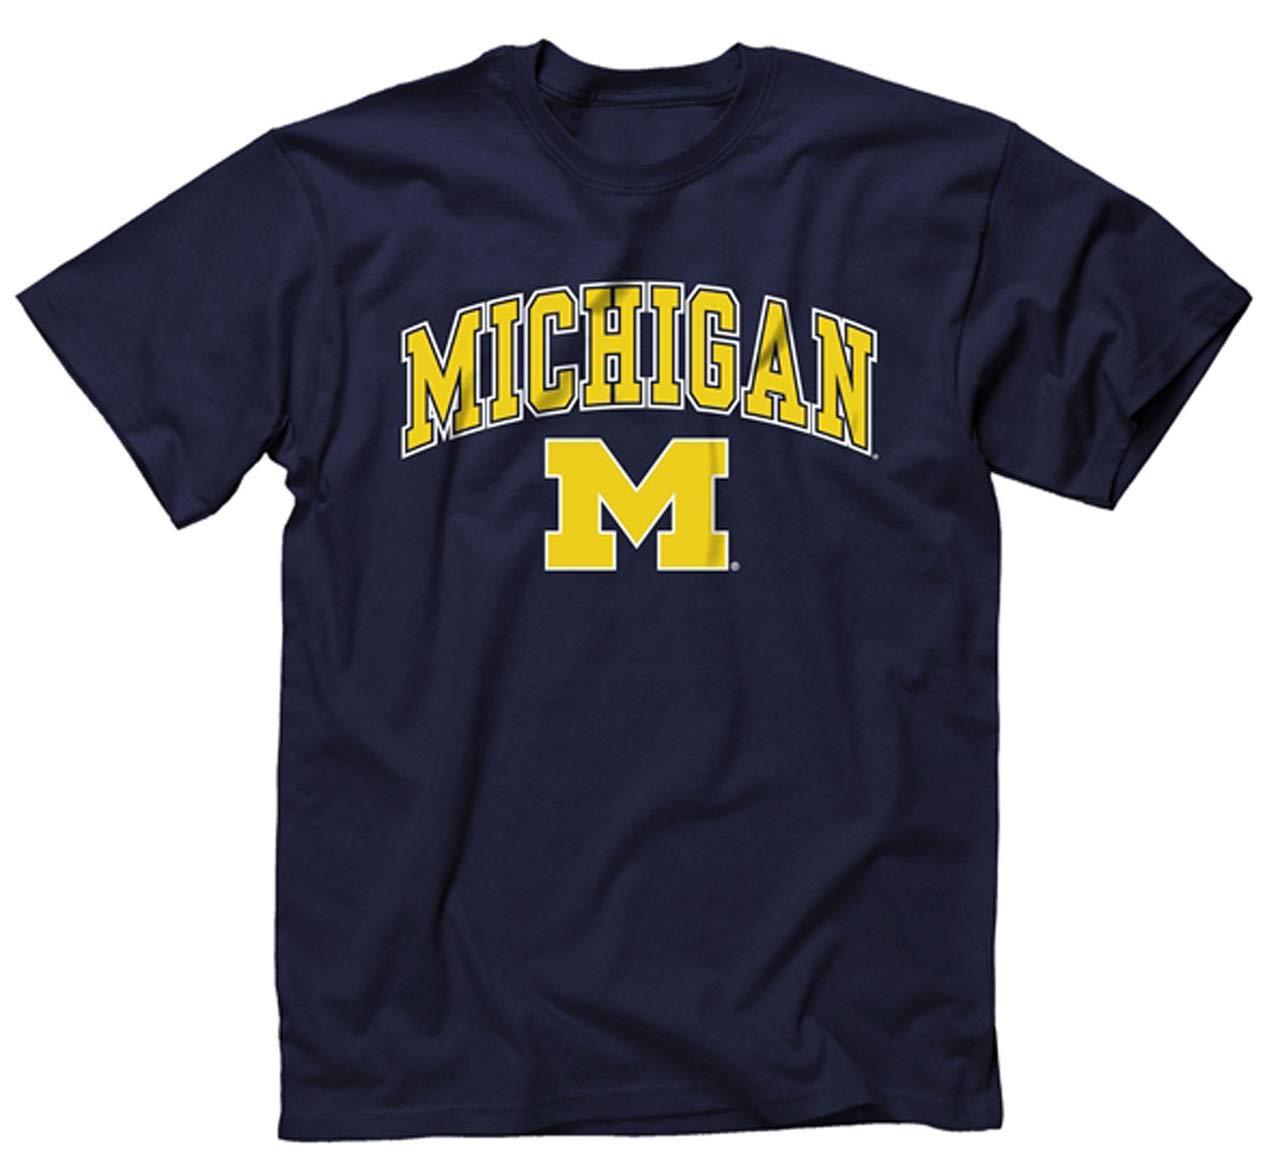 Michigan Wolverines Erwachsene Arch /& Logo Soft Style Gameday Shirt Marineblau,